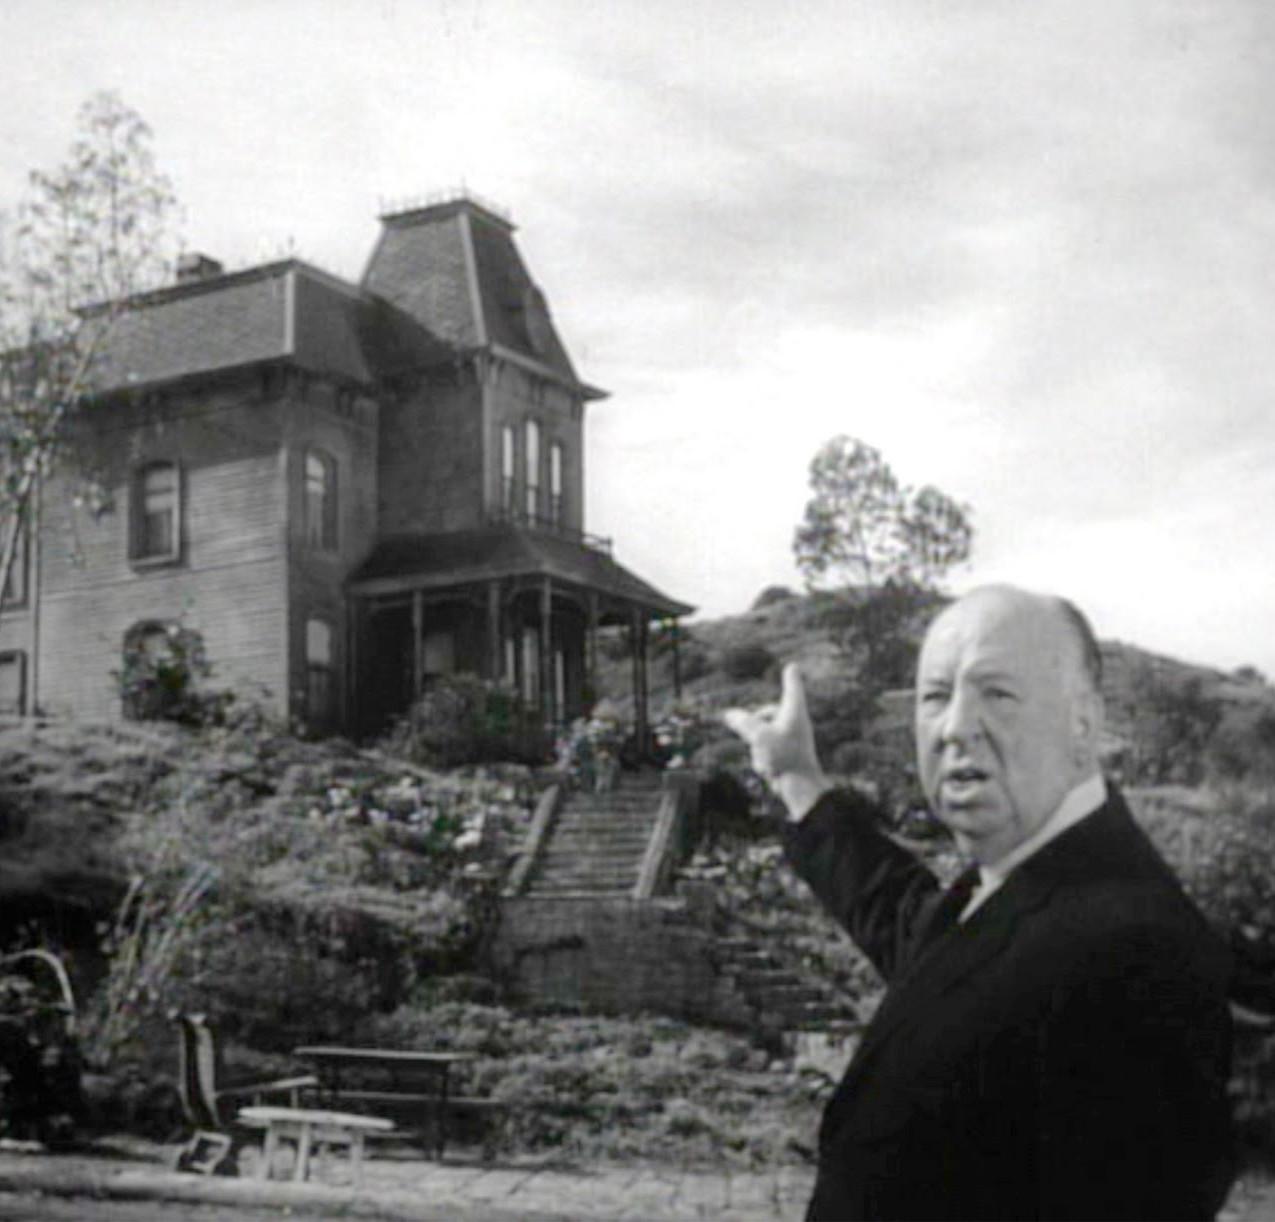 Hitch, 1960